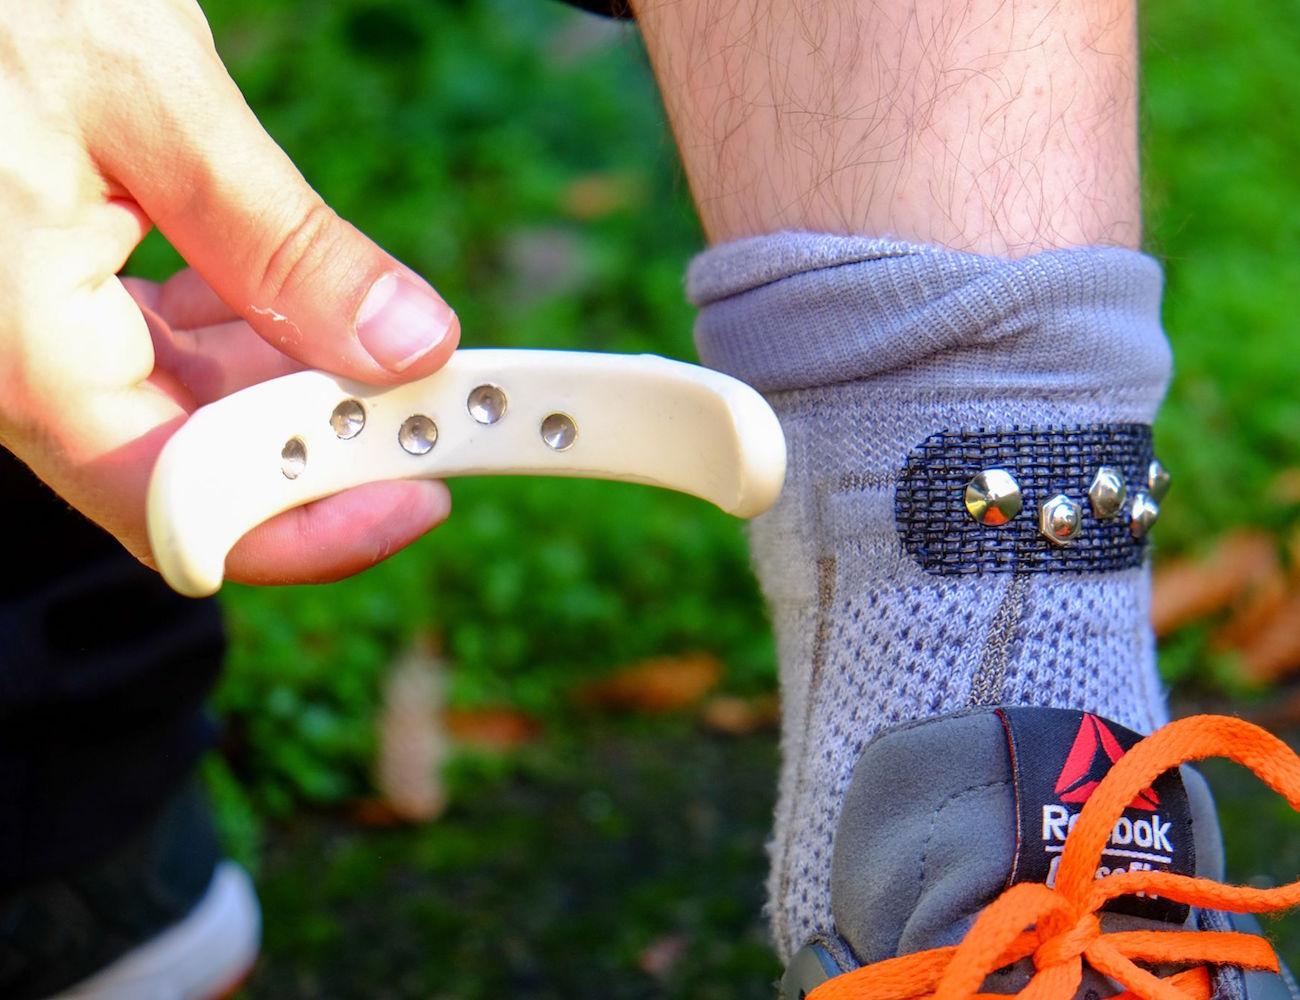 Sensoria – Smart Socks to Track Your Running